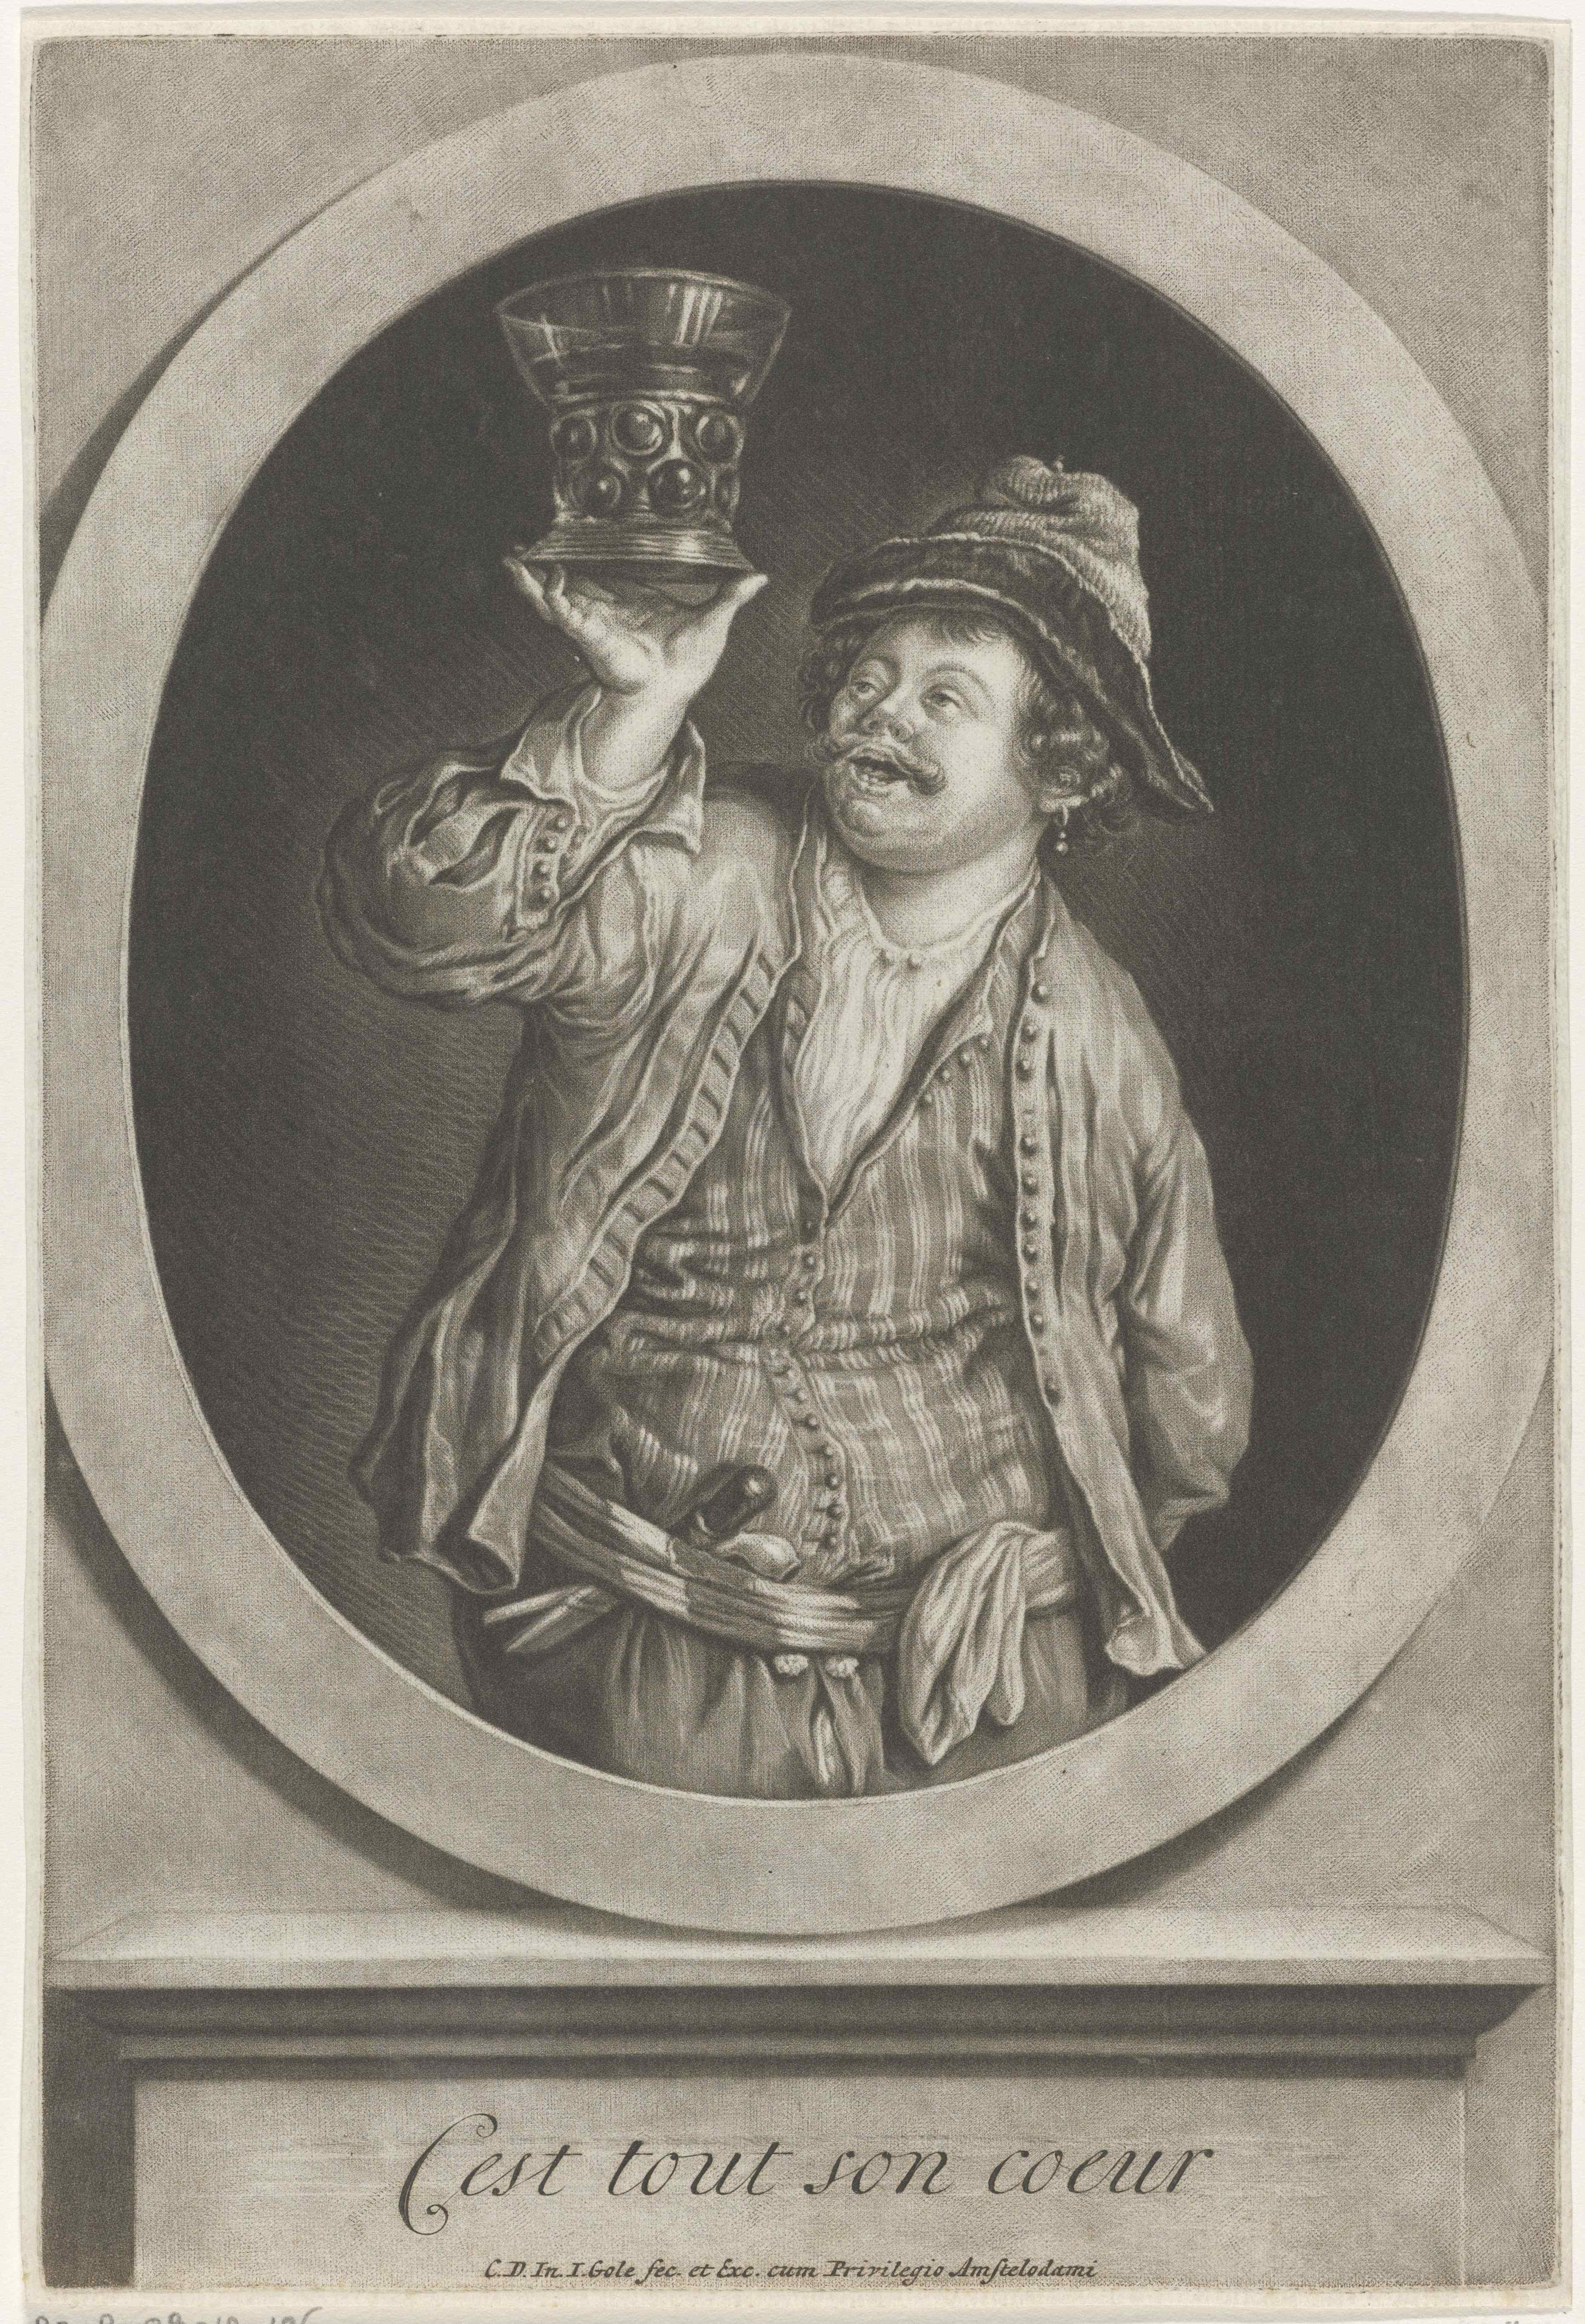 Dutch Seaman with Rummer